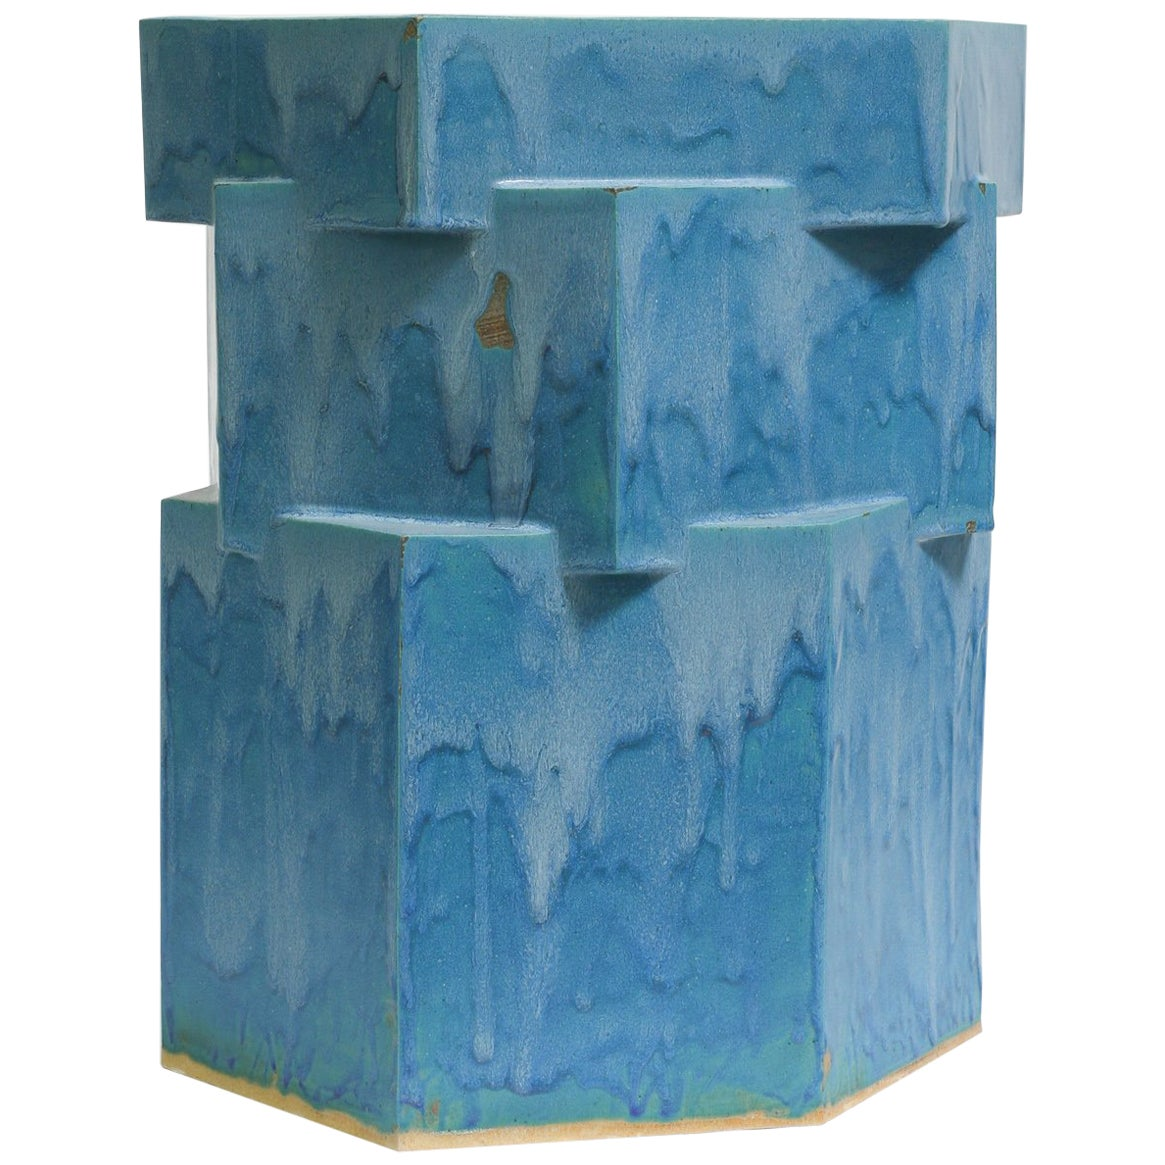 Extra Large Contemporary Ceramic Teal Hexagon Planter